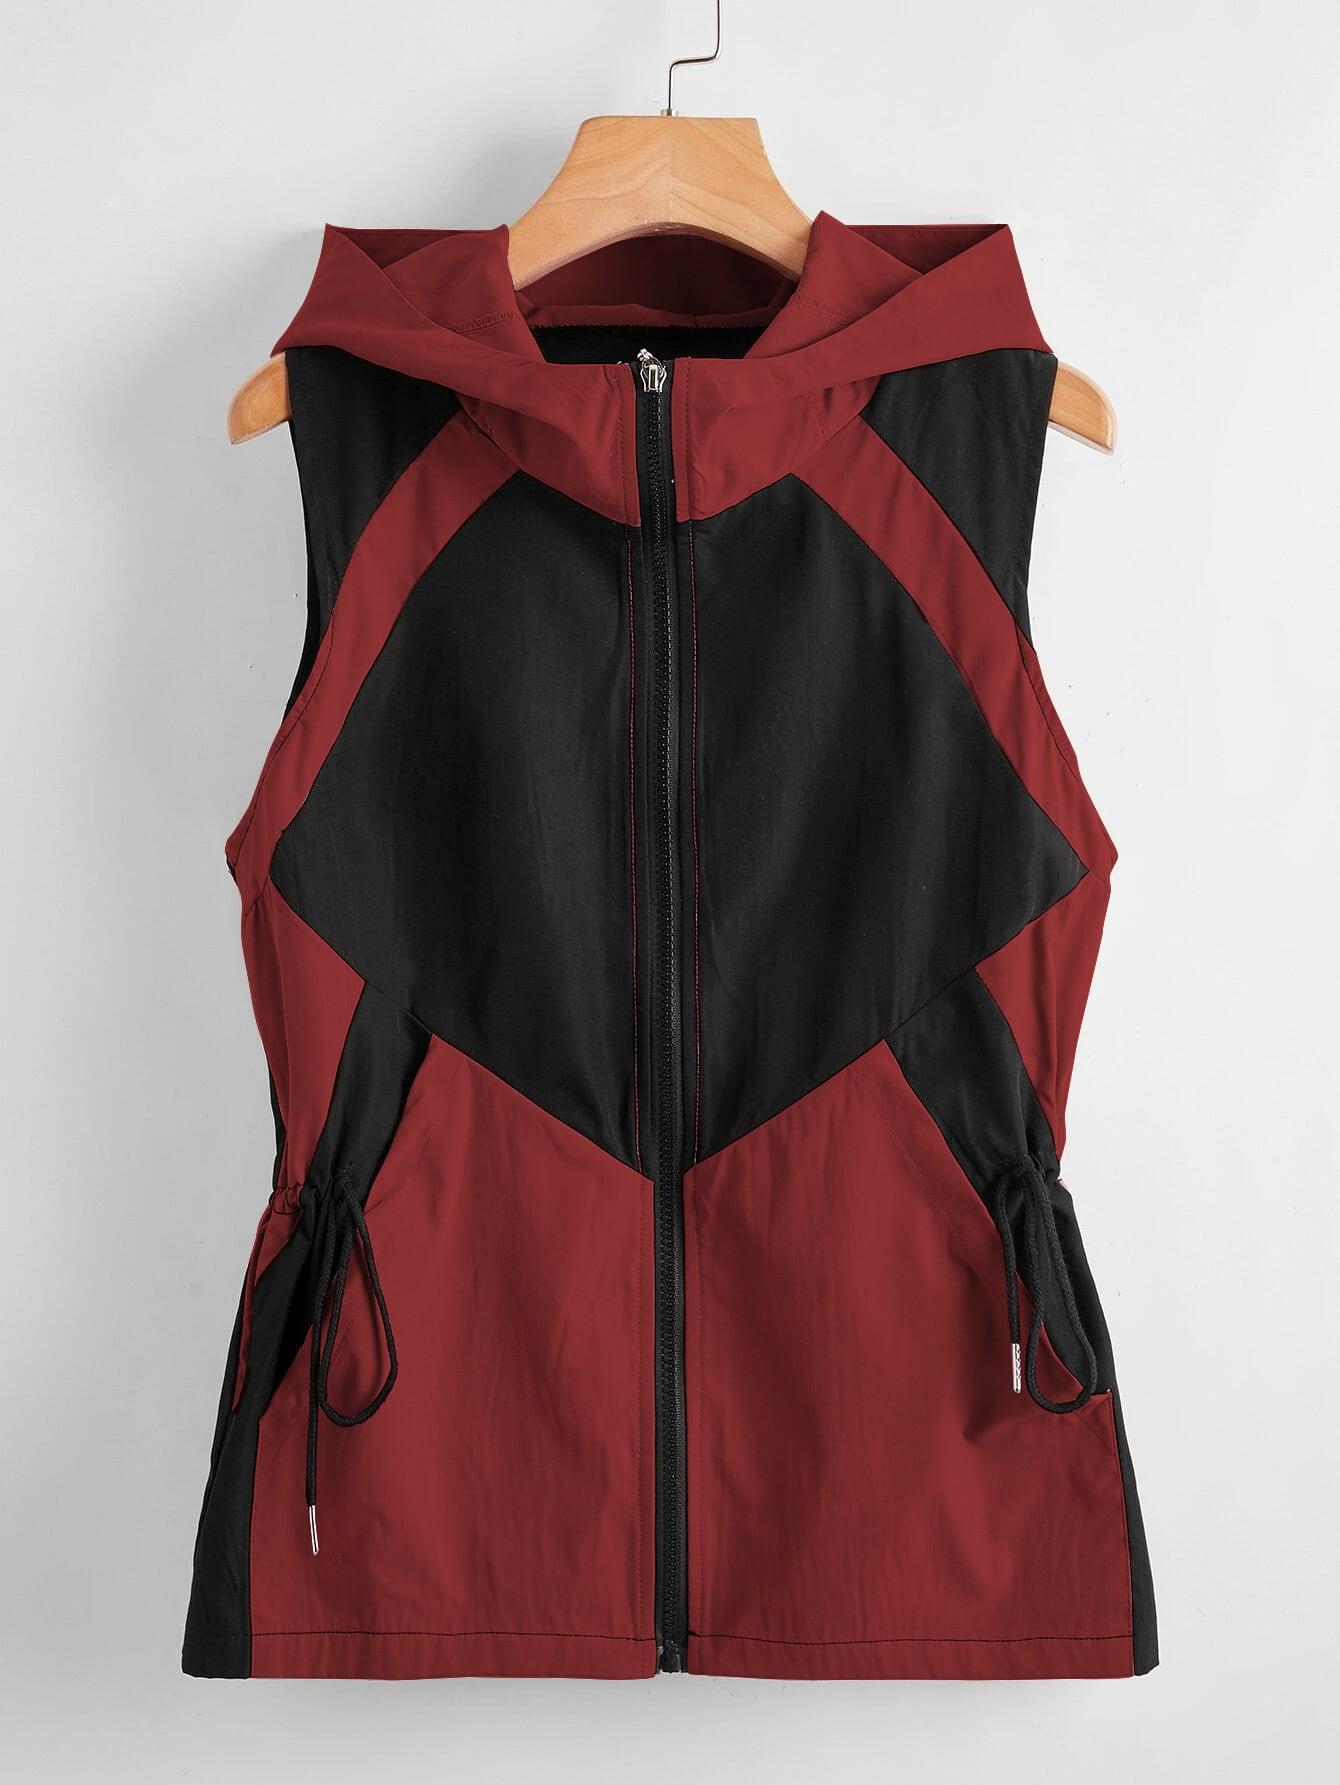 drawstring zip up hooded sleeveless jacket